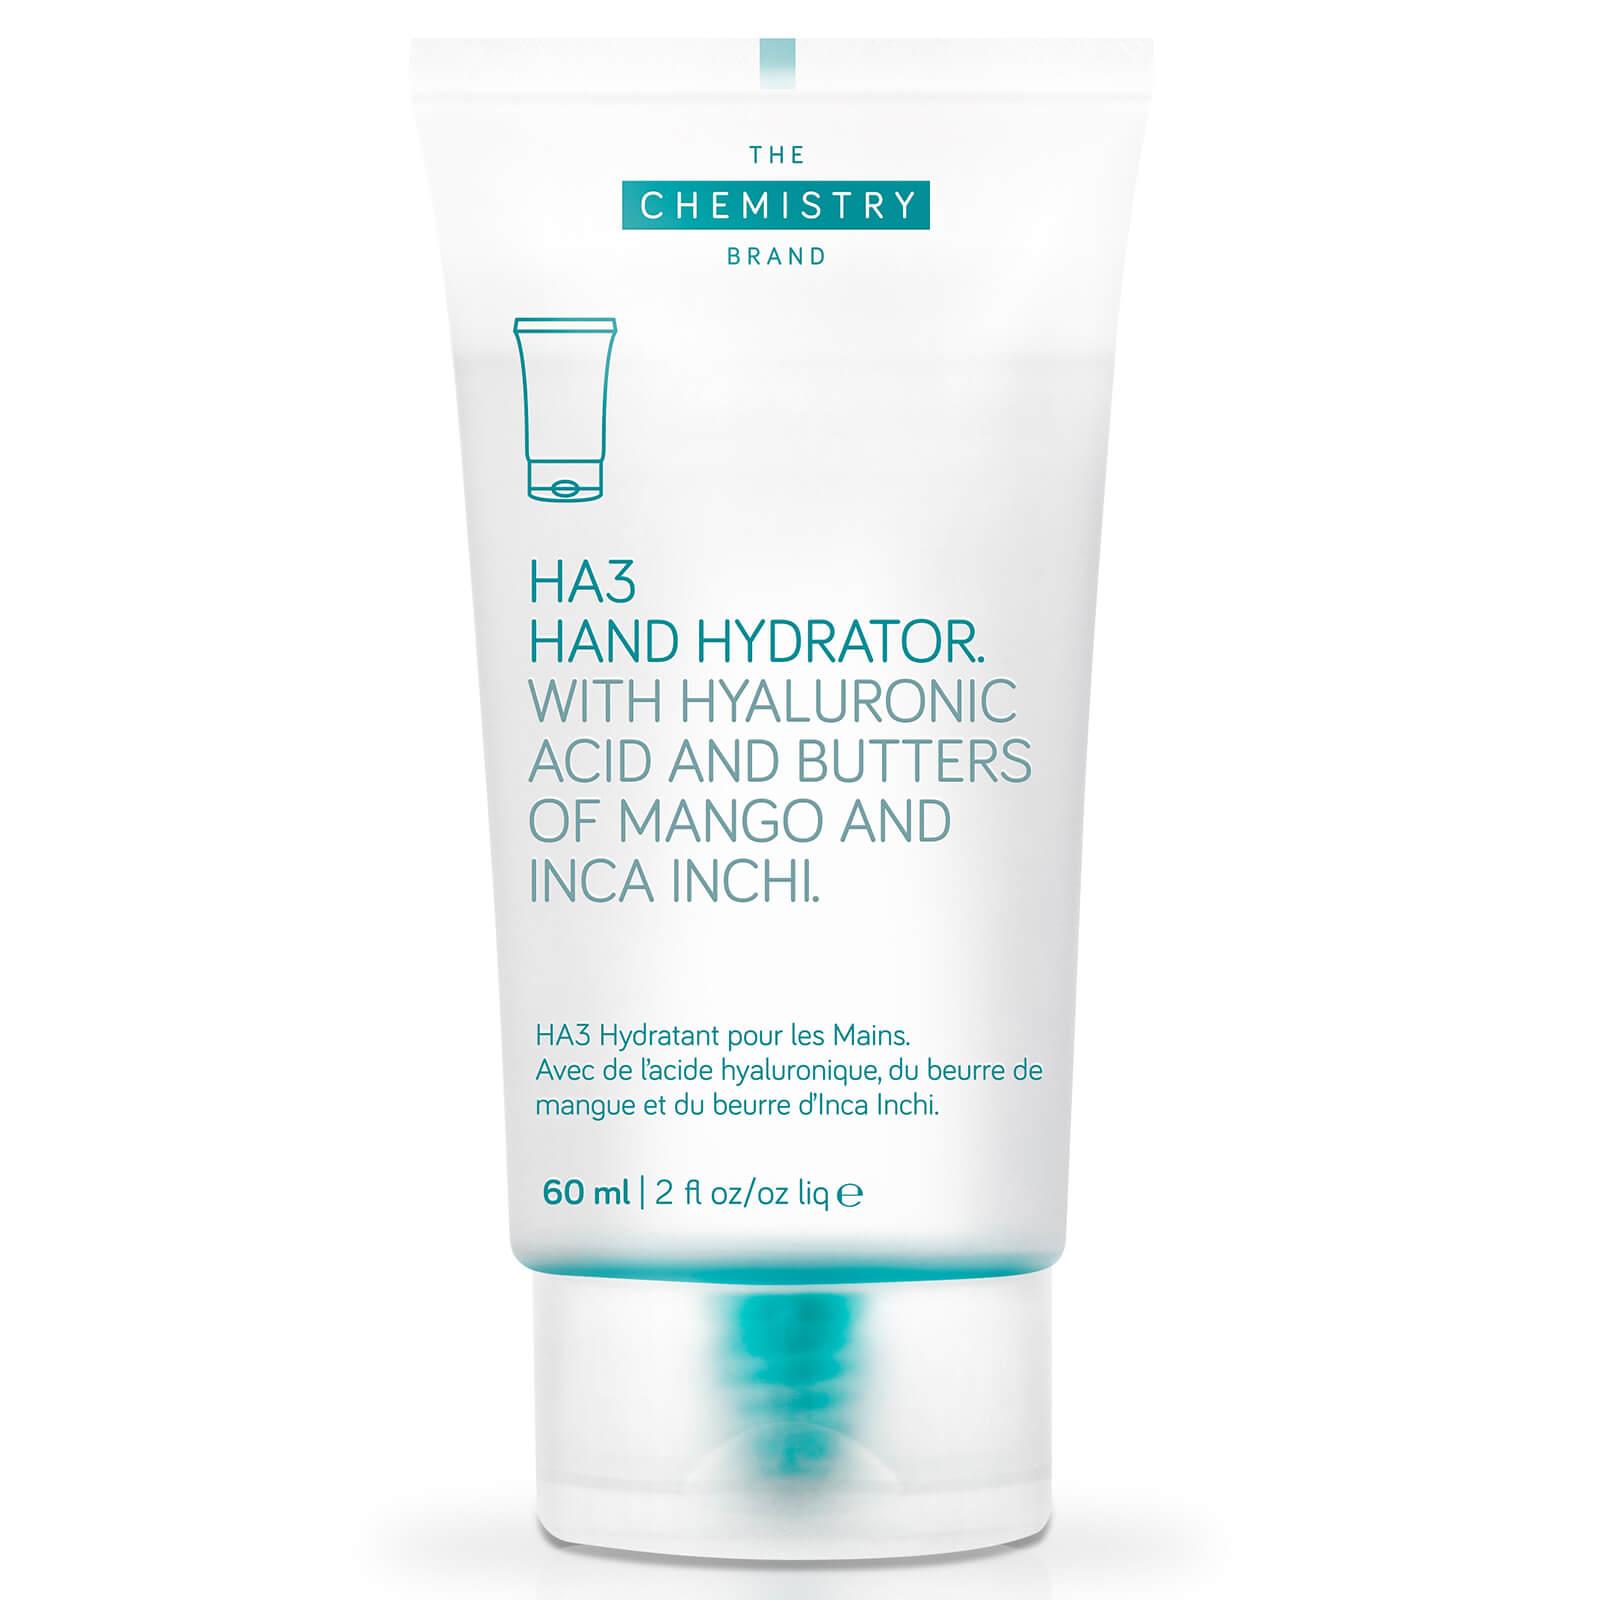 Купить Увлажняющий крем для рук с гиалуроновой кислотой Chemistry Brand Ha3:Triple Function Hyaluronic Rich Hydrator Hand Cream 60мл